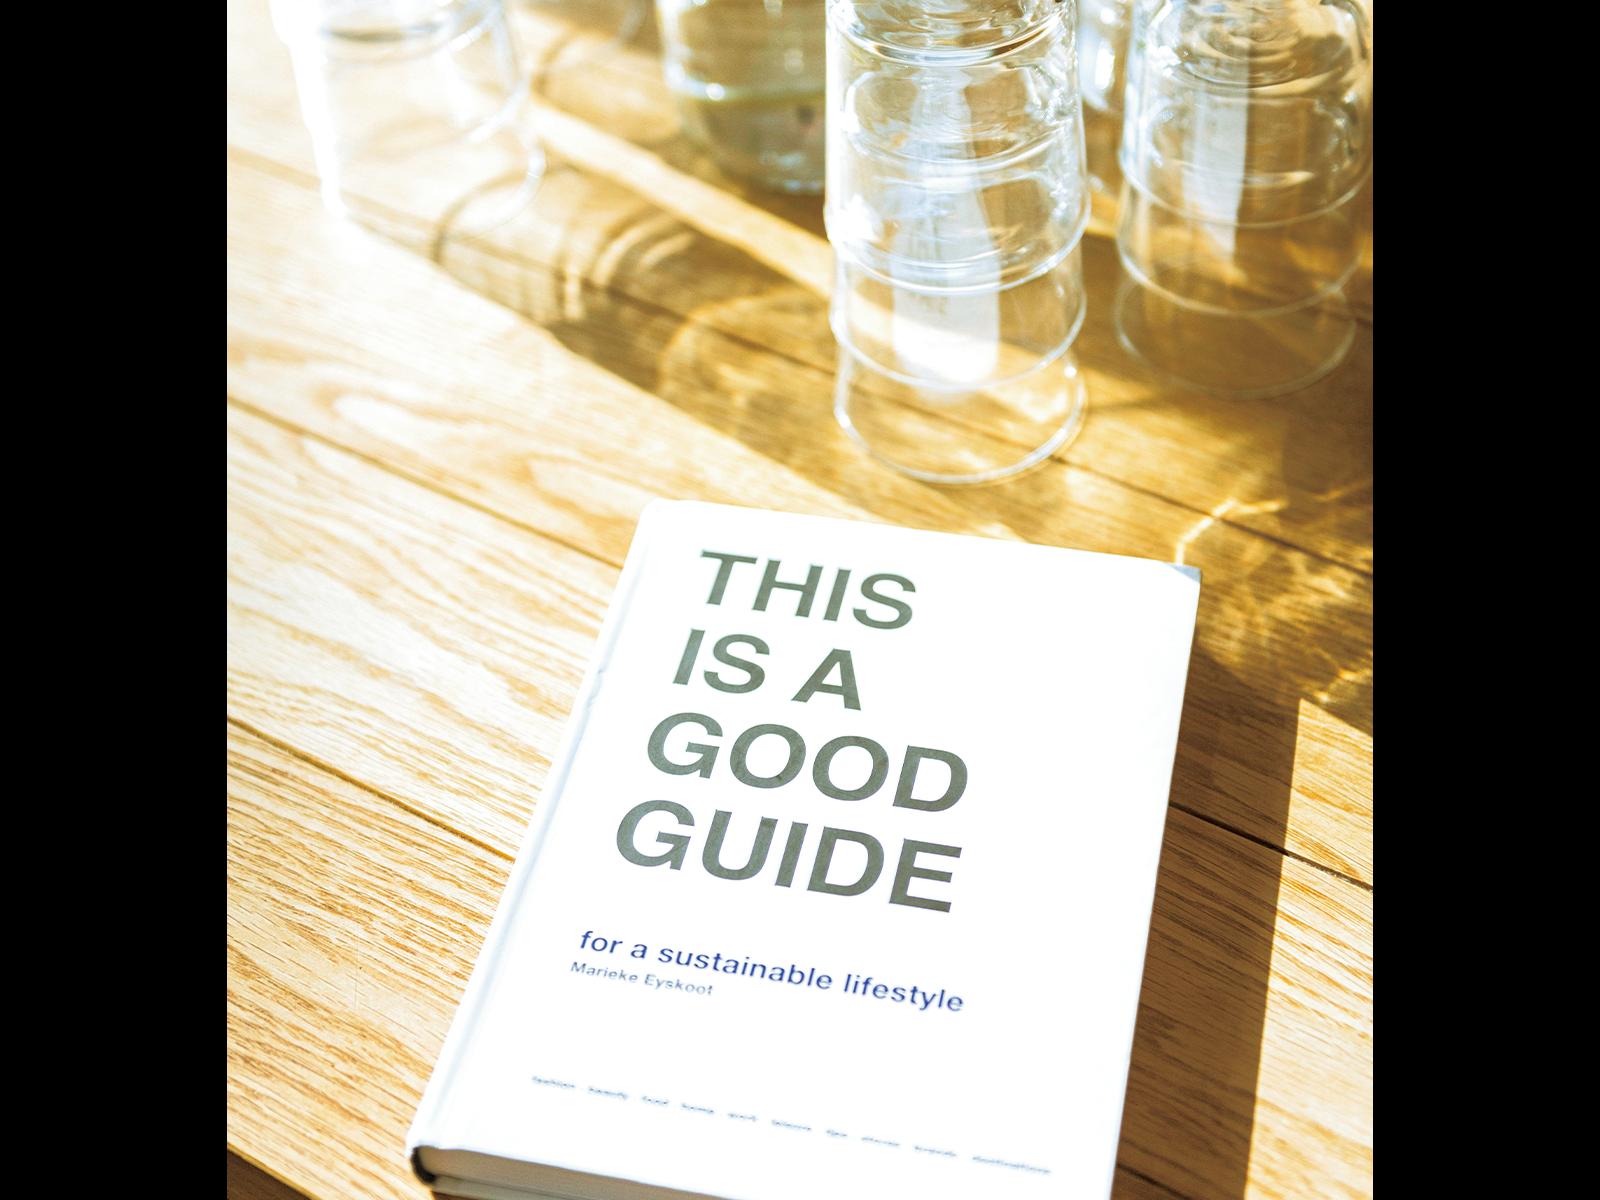 『THIS IS A GOOD GUIDE』は現在、オランダ語版と英語版がある。「今後は日本語版もつくれたら……」と期待を寄せるマリケさん。